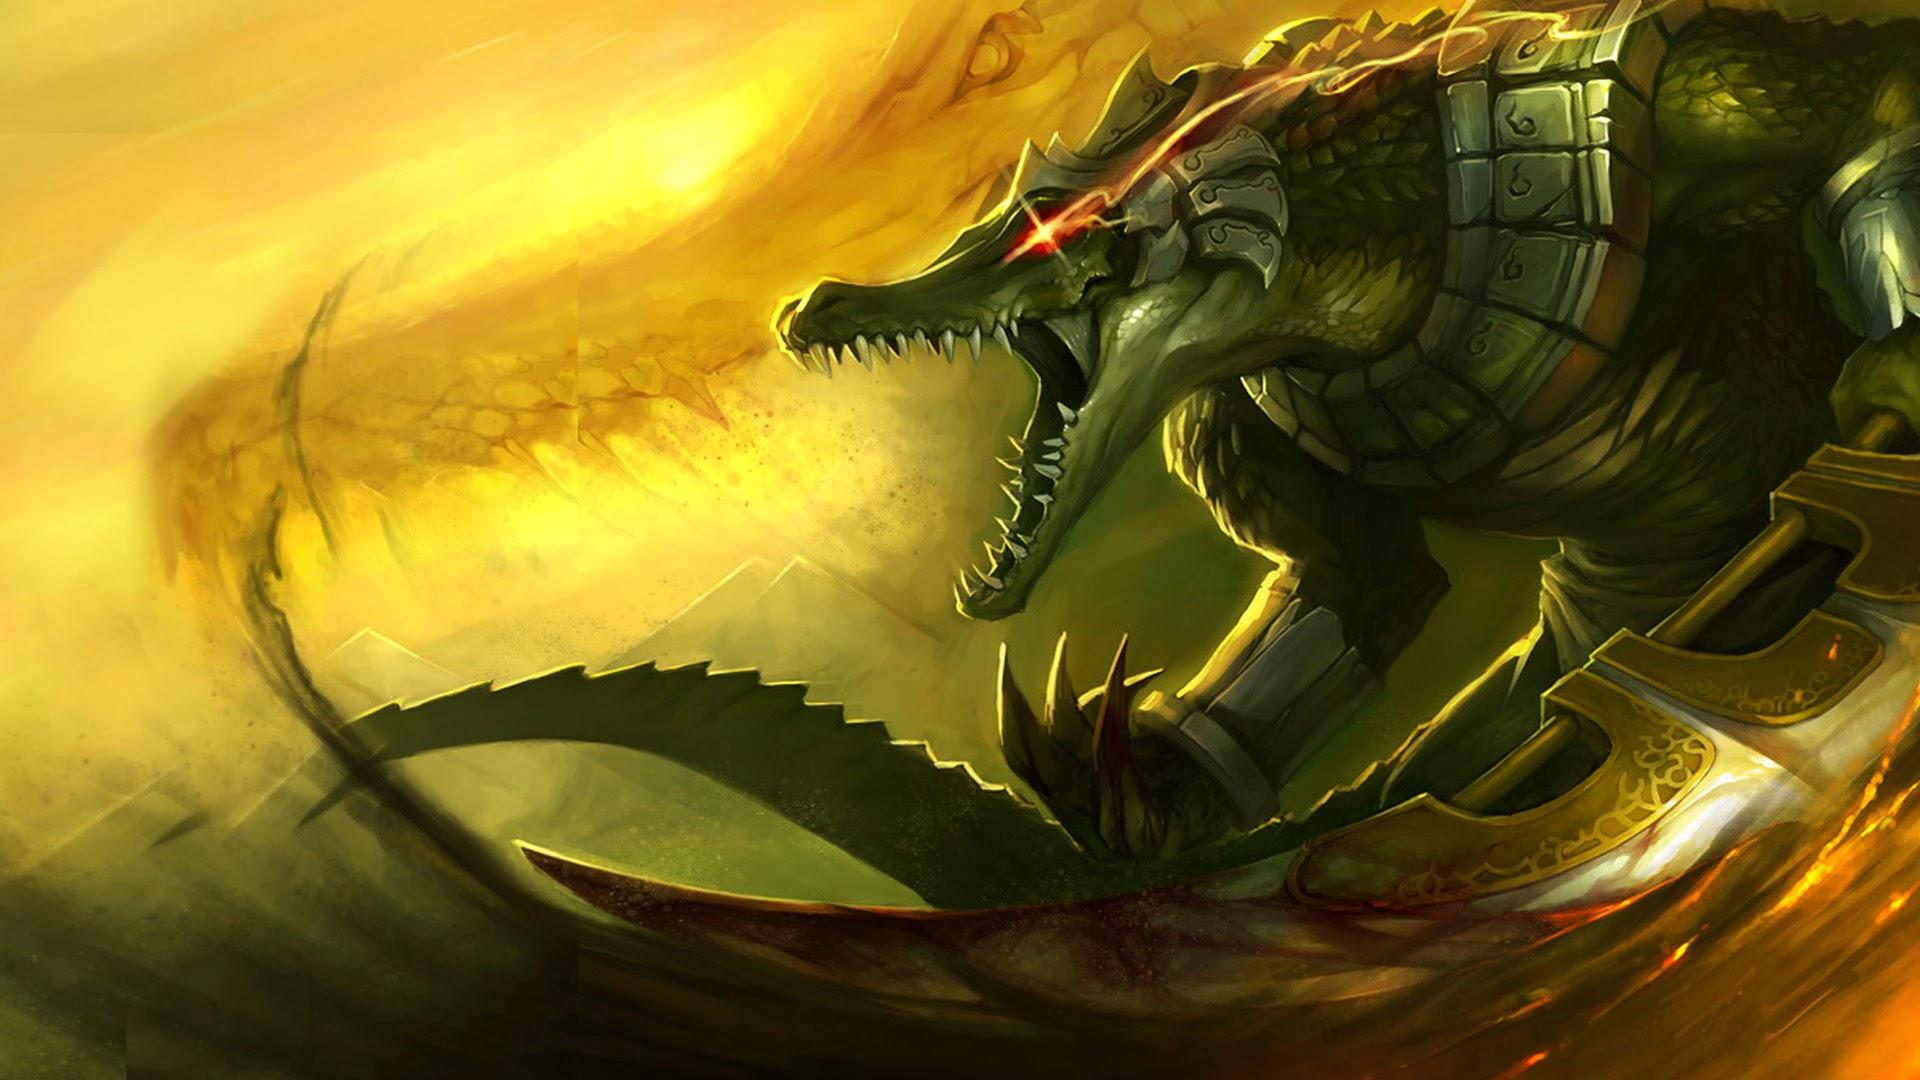 Renekton League of Legends 6j Wallpaper HD